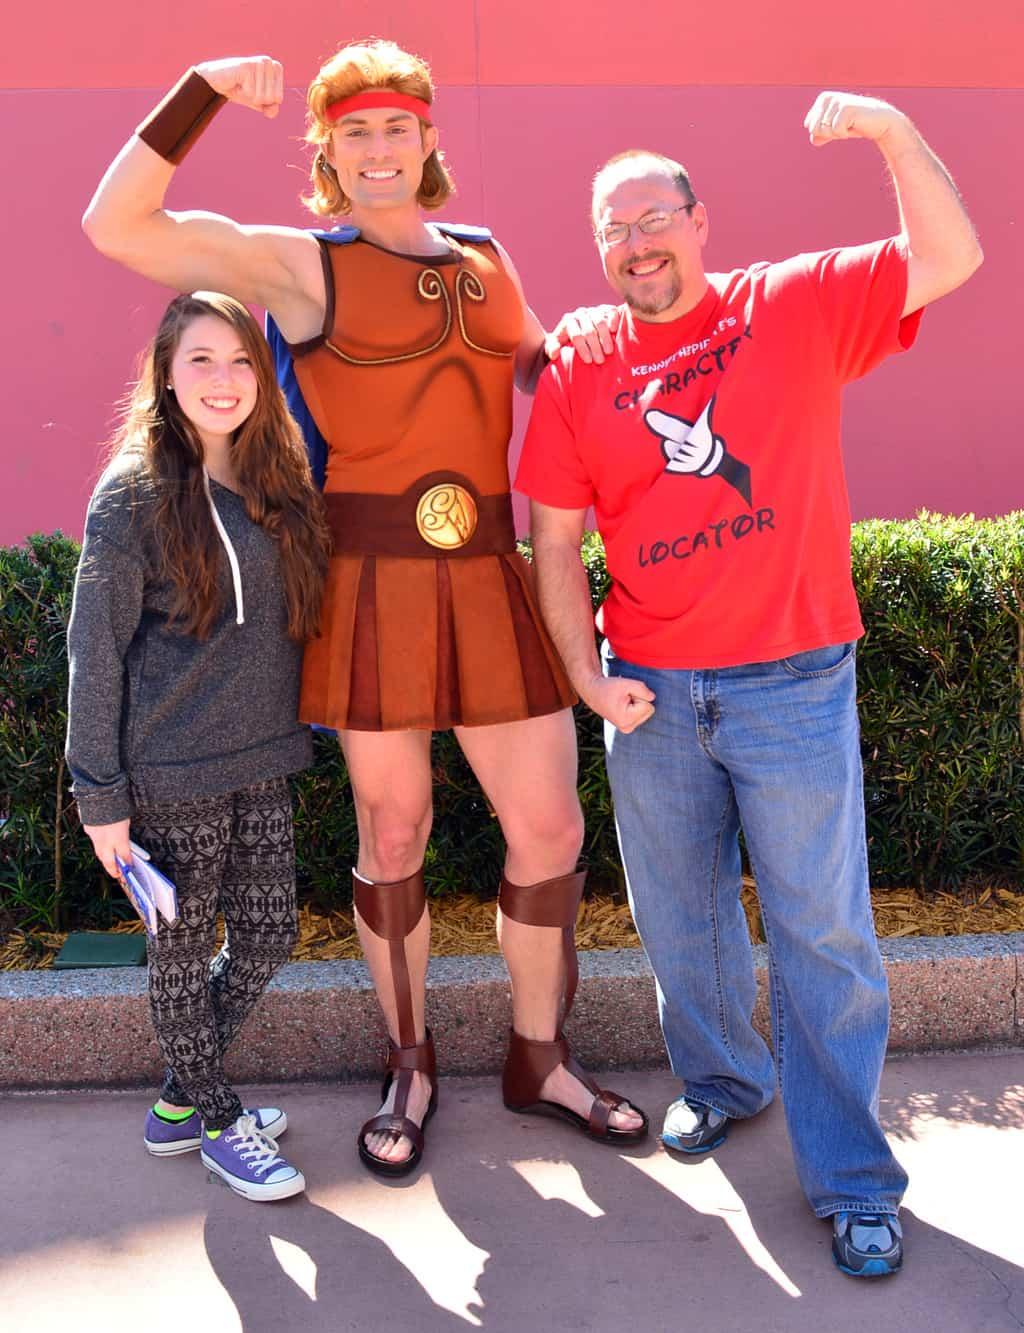 Walt Disney World, Epcot, Characters, Meet and Greet, Hercules, Epcot Character Traiining